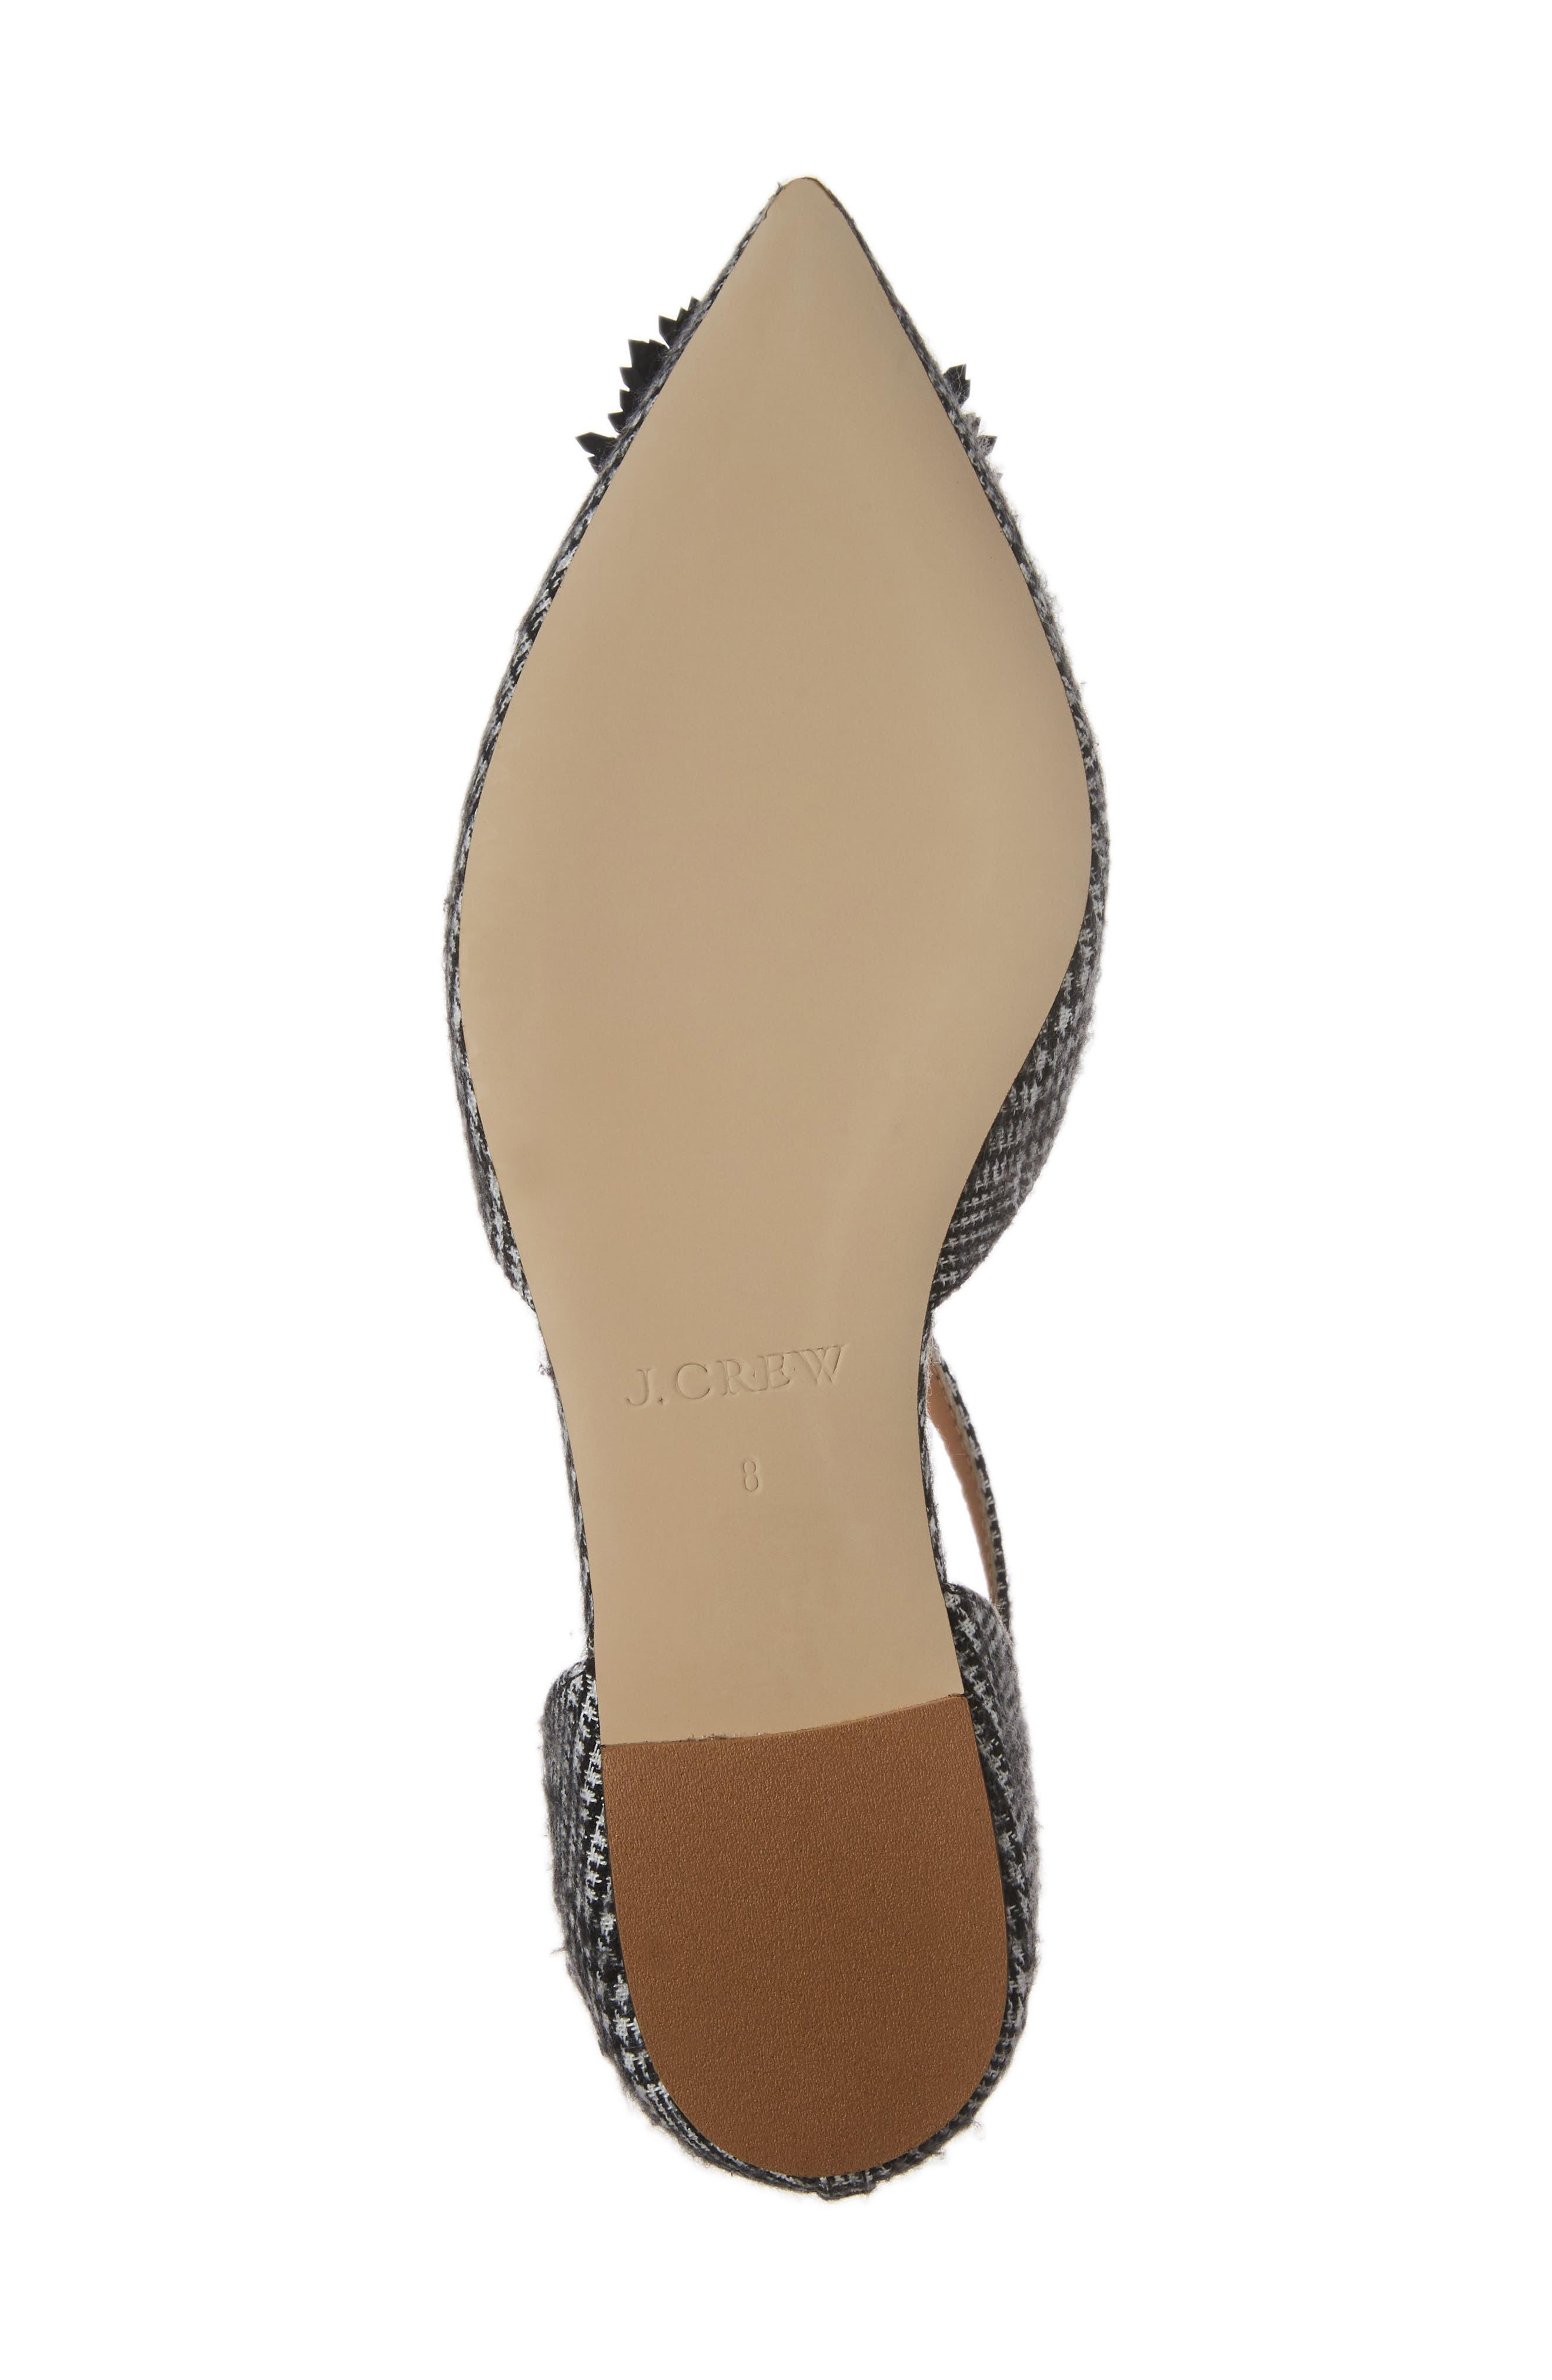 Sadie Cross Strap Pointy Toe Flat,                             Alternate thumbnail 6, color,                             Black/ White Fabric